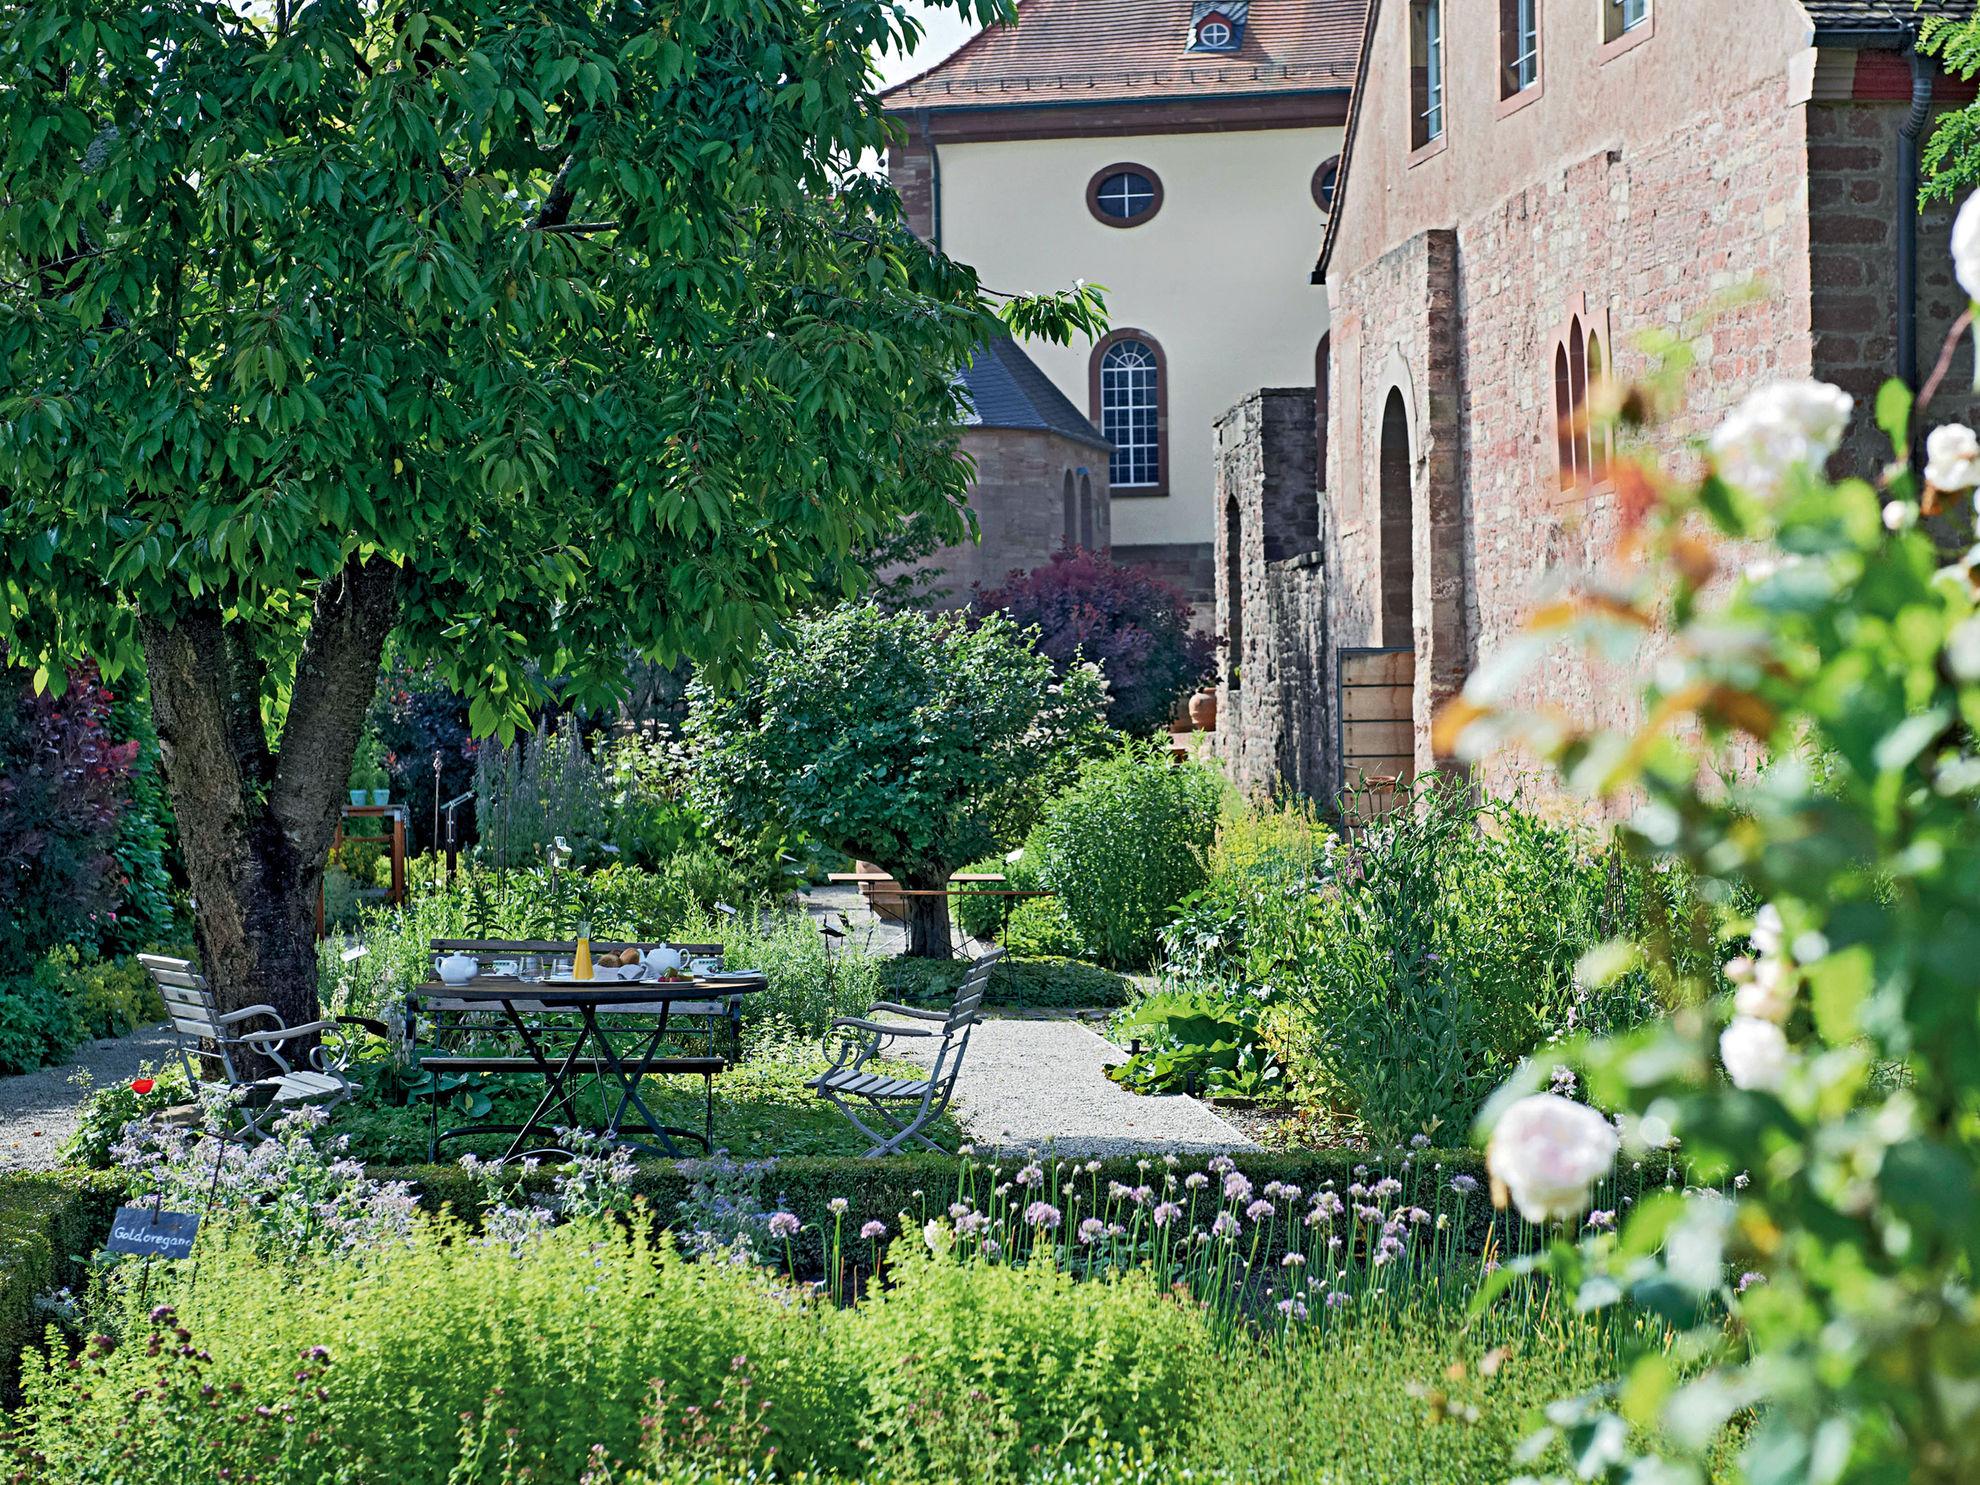 Abb. Hotel Kloster Hornbach